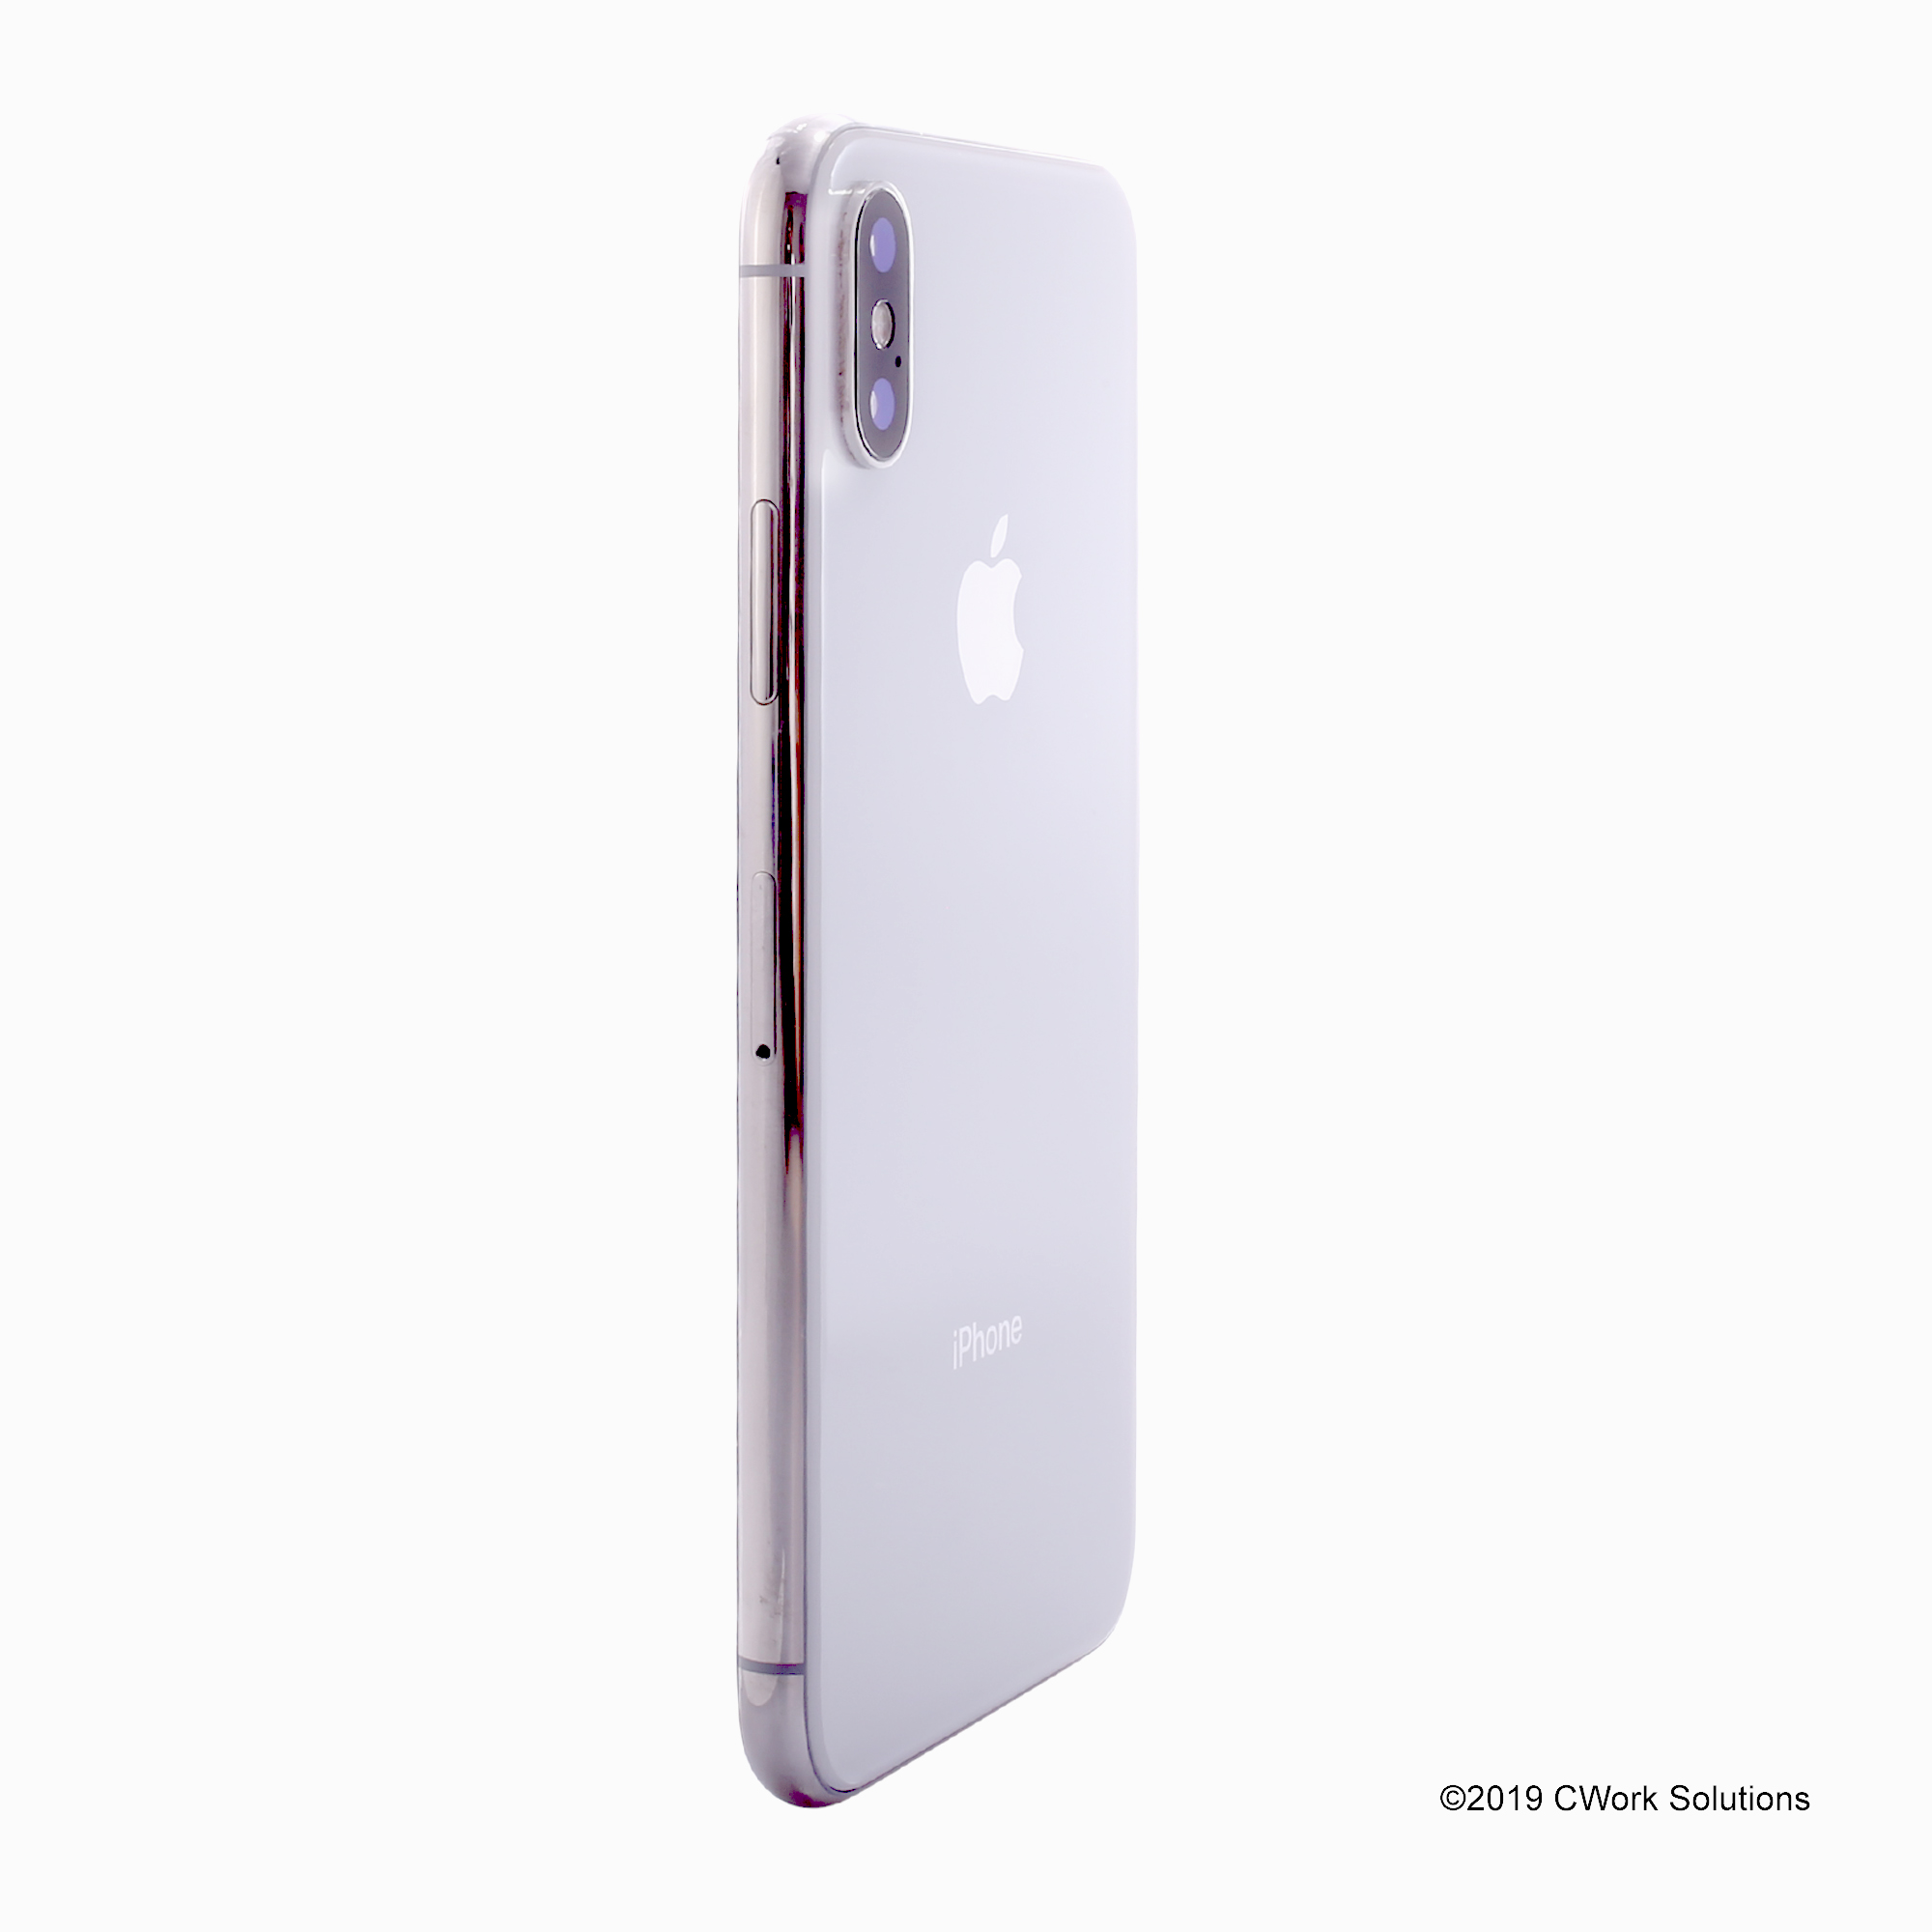 Apple-iPhone-X-a1865-64GB-Verizon-Unlocked-Very-Good thumbnail 7